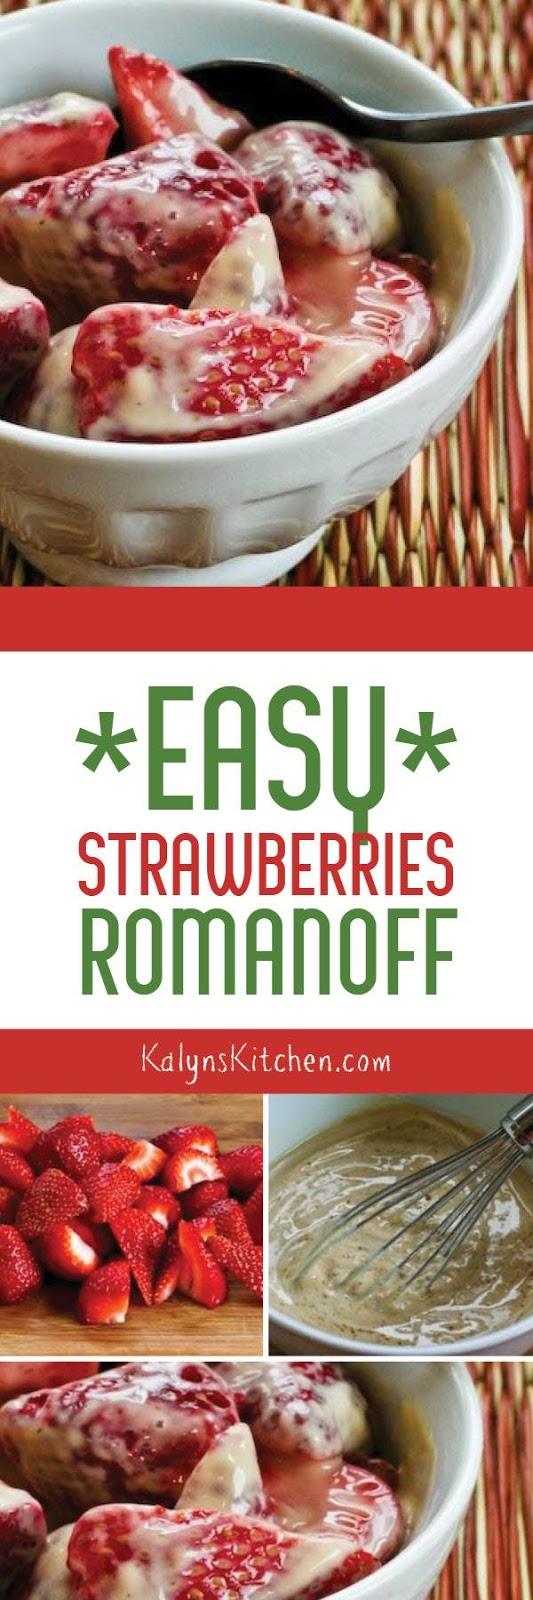 Easy Strawberries Romanoff found on KalynsKitchen.com